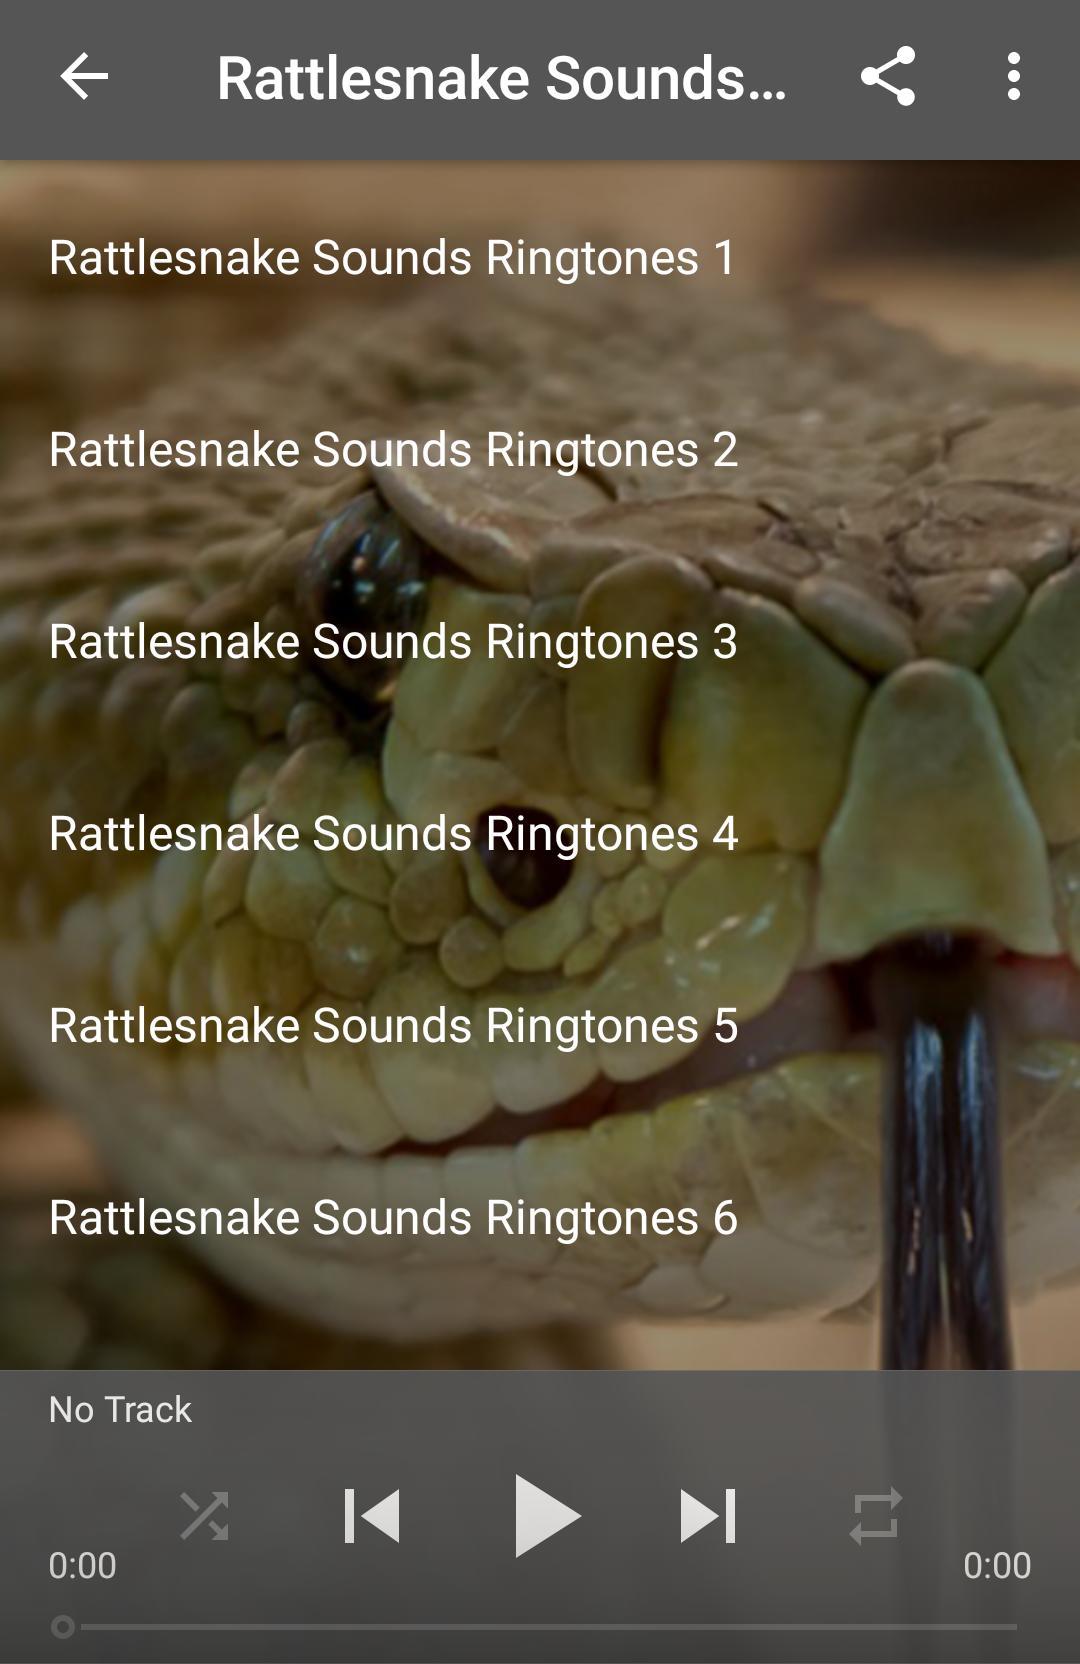 Rattlesnake Sounds Ringtones for Android - APK Download